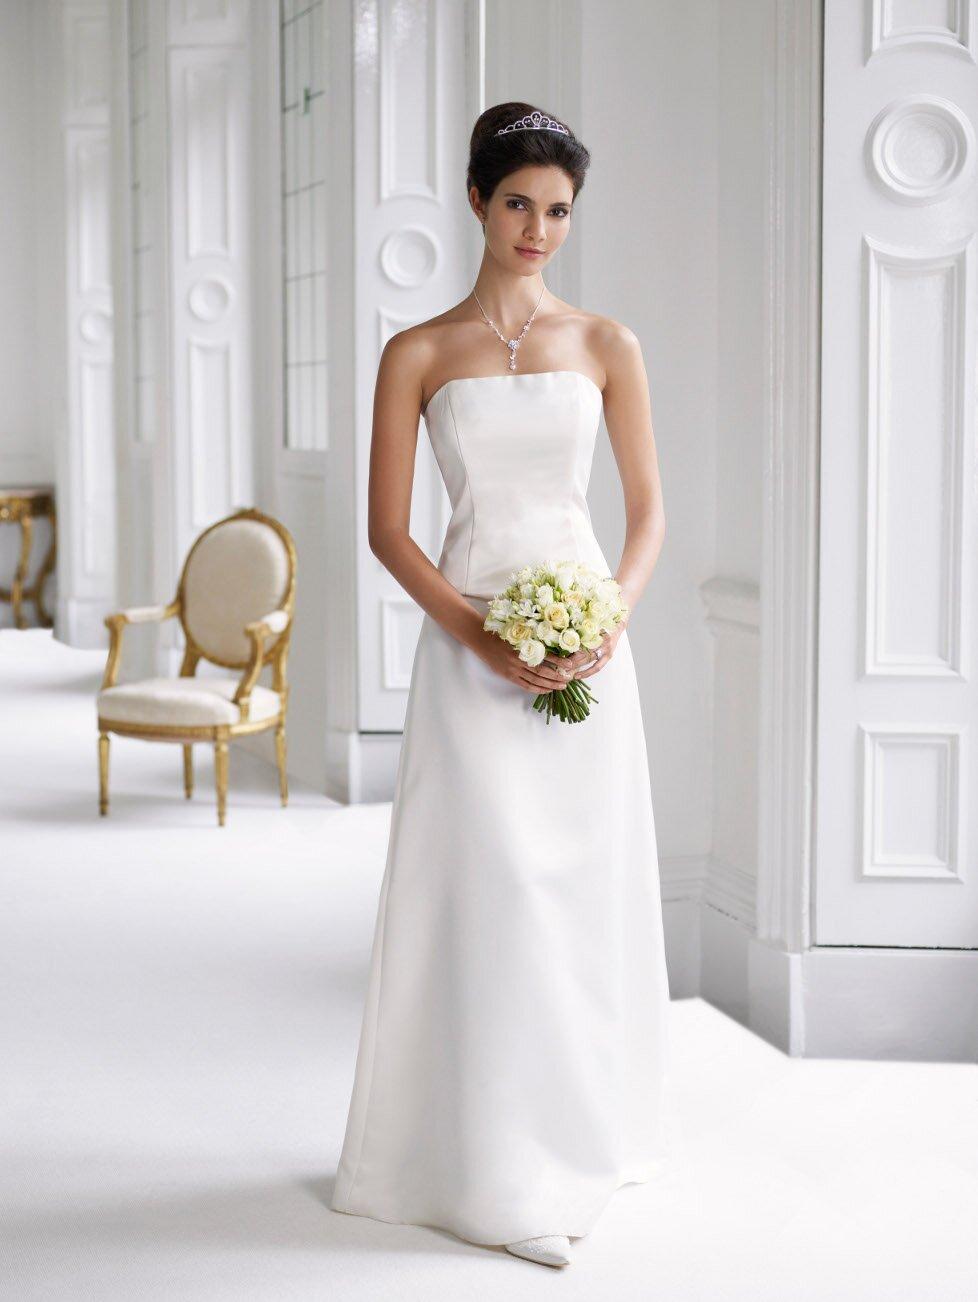 Wedding Dresses For Small Weddings Photo 1